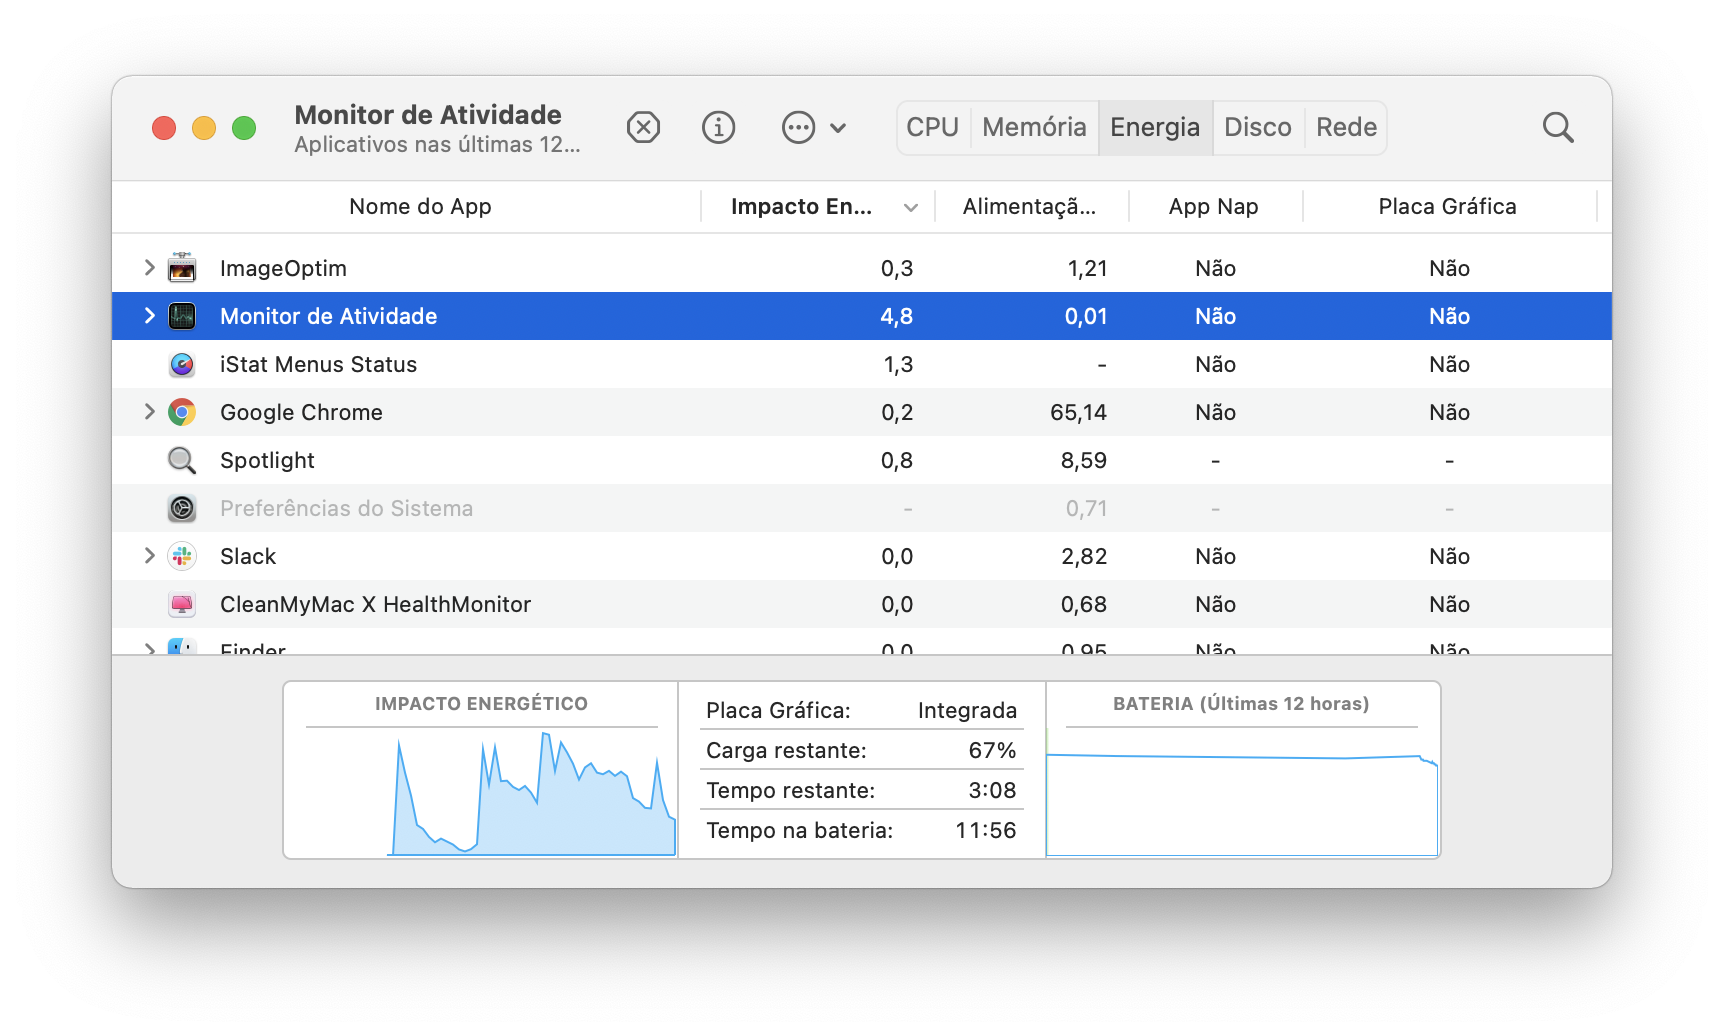 App Monitor de Atividade